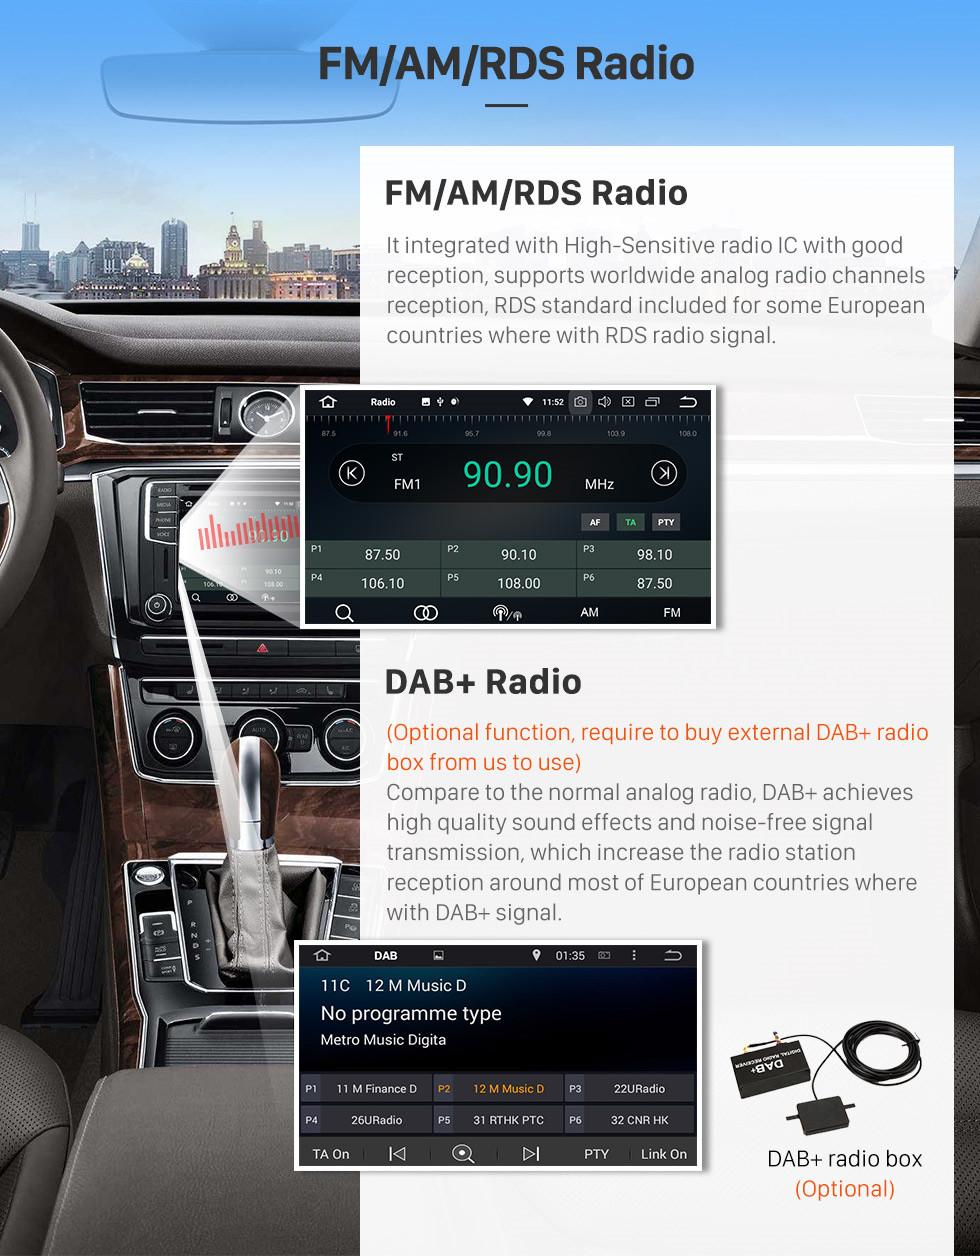 Seicane 2015 2016 Hyundai IX35 TUCSON(LHD) Android 8.0 HD 1024*600 touch screen DVD player GPS Navigationssystem Radio Bluetooth  OBD2 DVR Rückfahr kamera TV 3G WIFI Lenkrad-Steuerung USB SD 1080P Video Spiegel-Verbindung